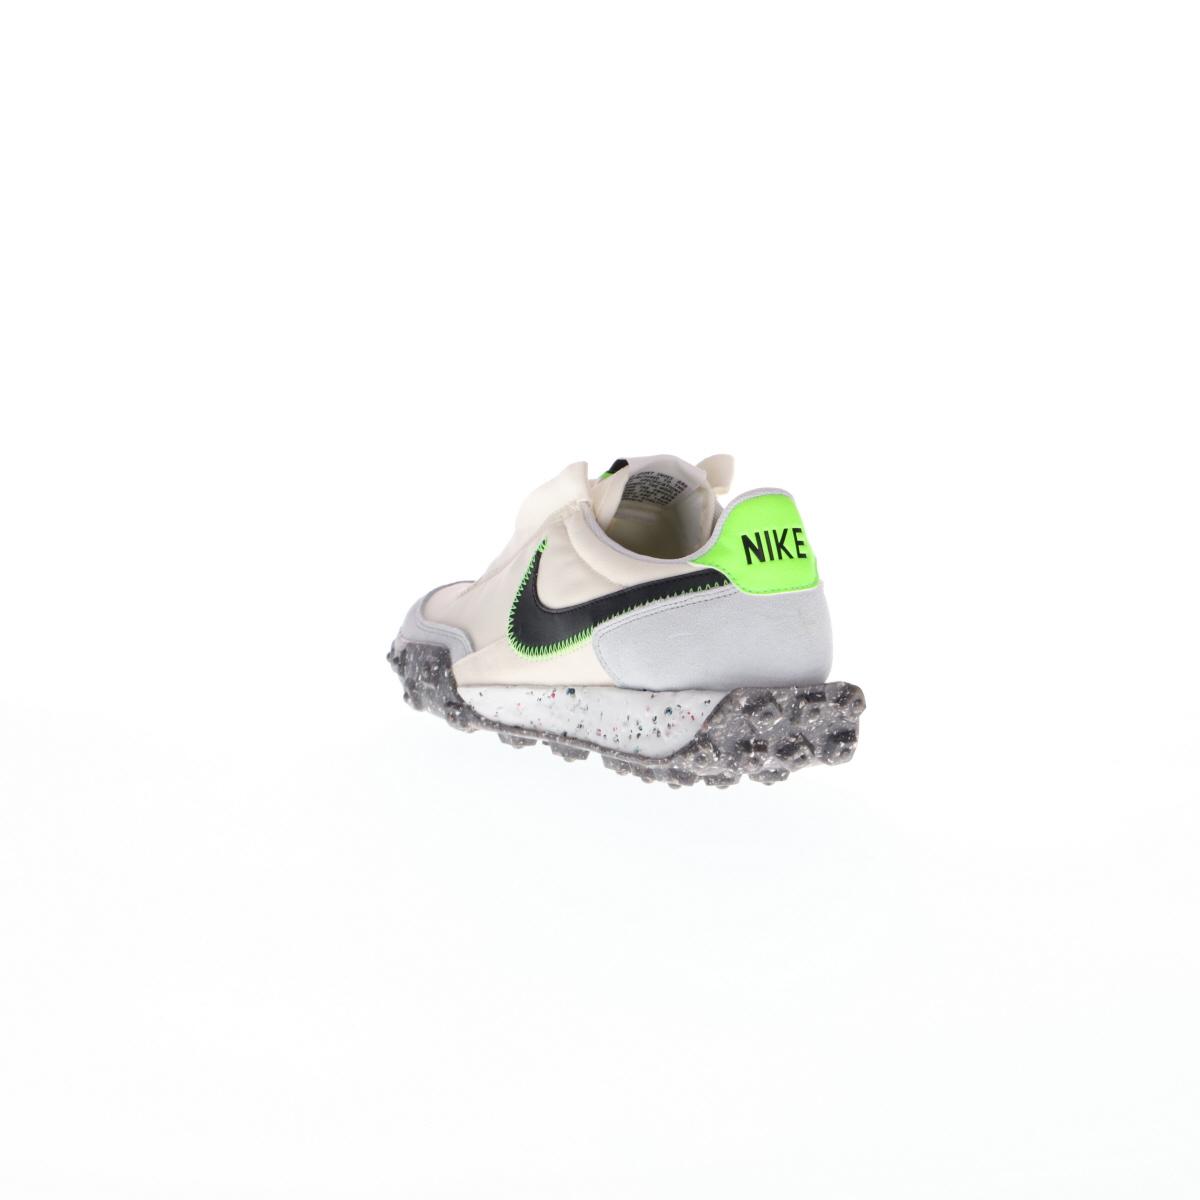 nike air max span sale women shoes for black boys